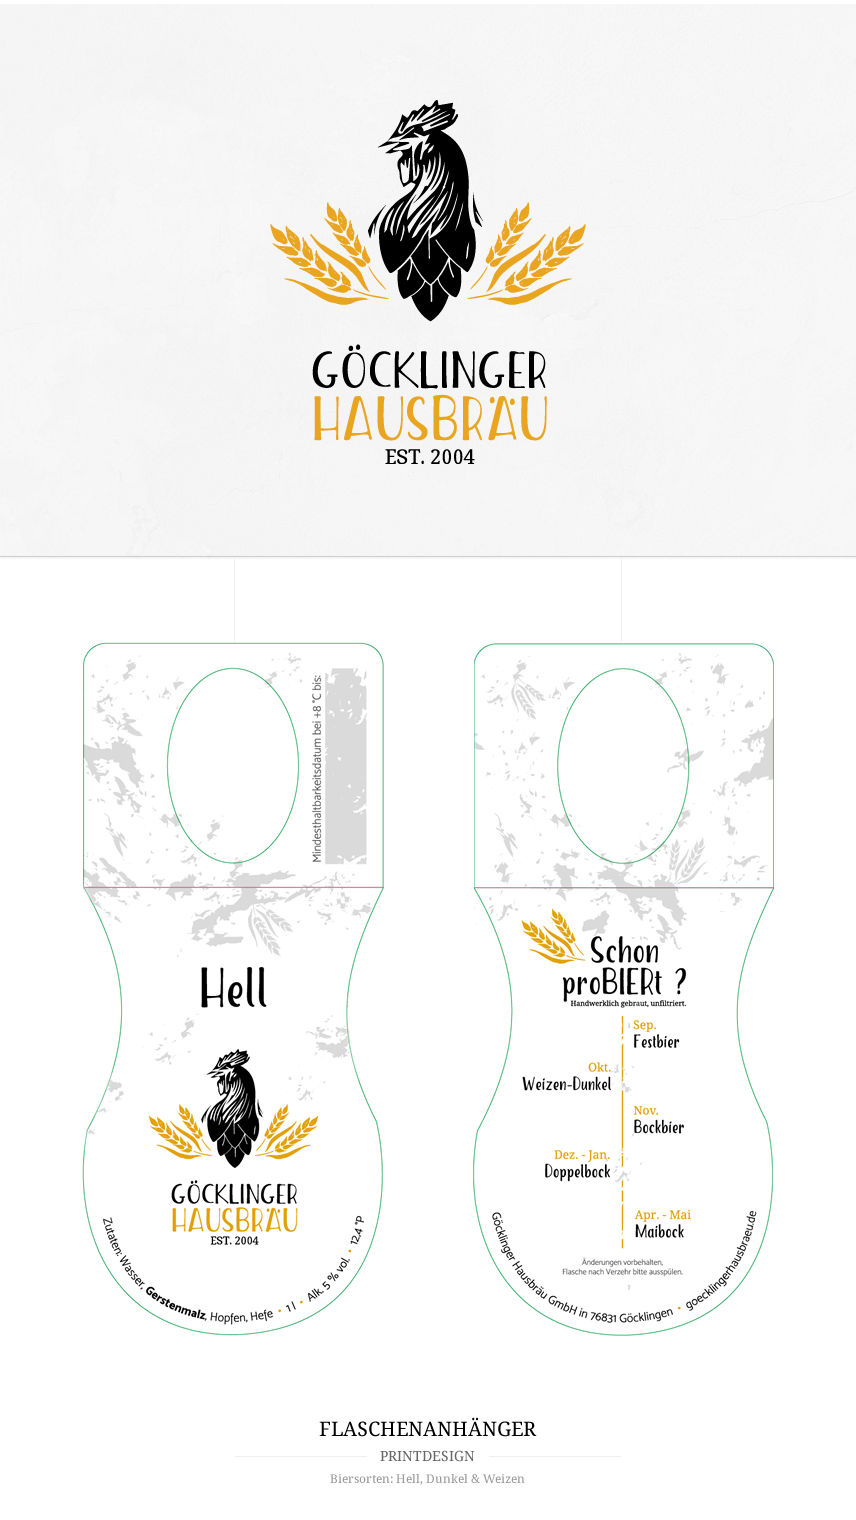 Logodesign, CI, Printdesign, Flaschenanhänger